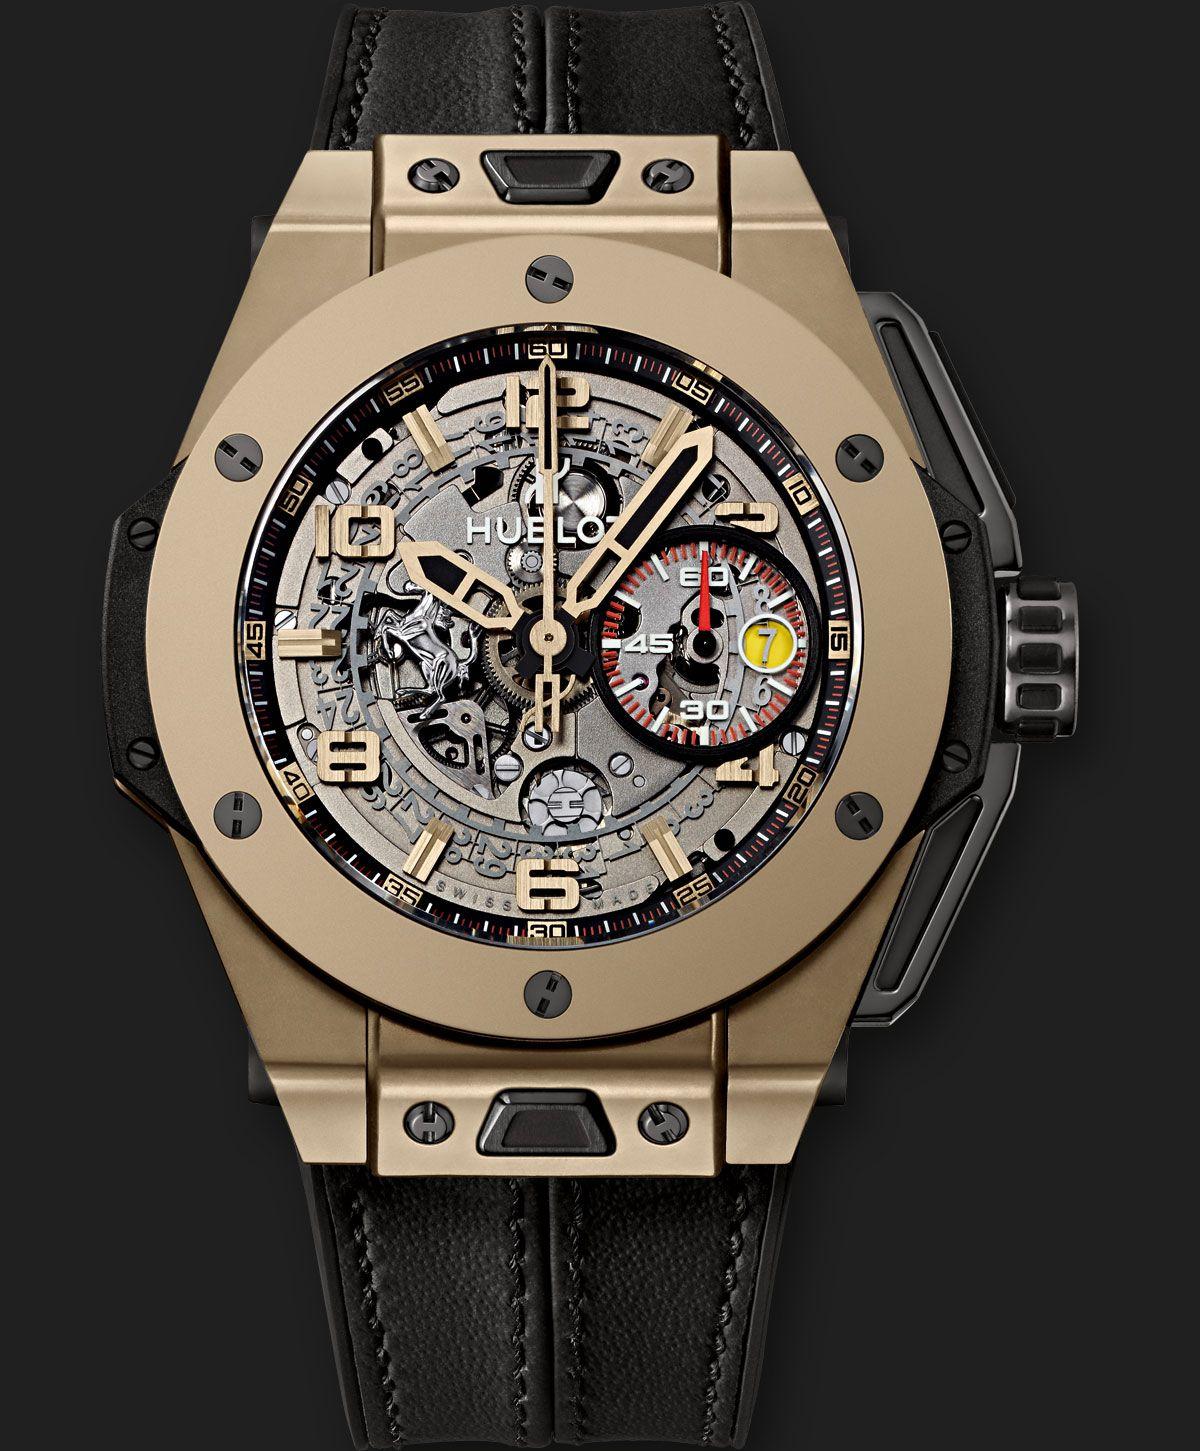 s ferrari men fiber aerodinamico strap pin for carbon sale watch silicone black dial watches